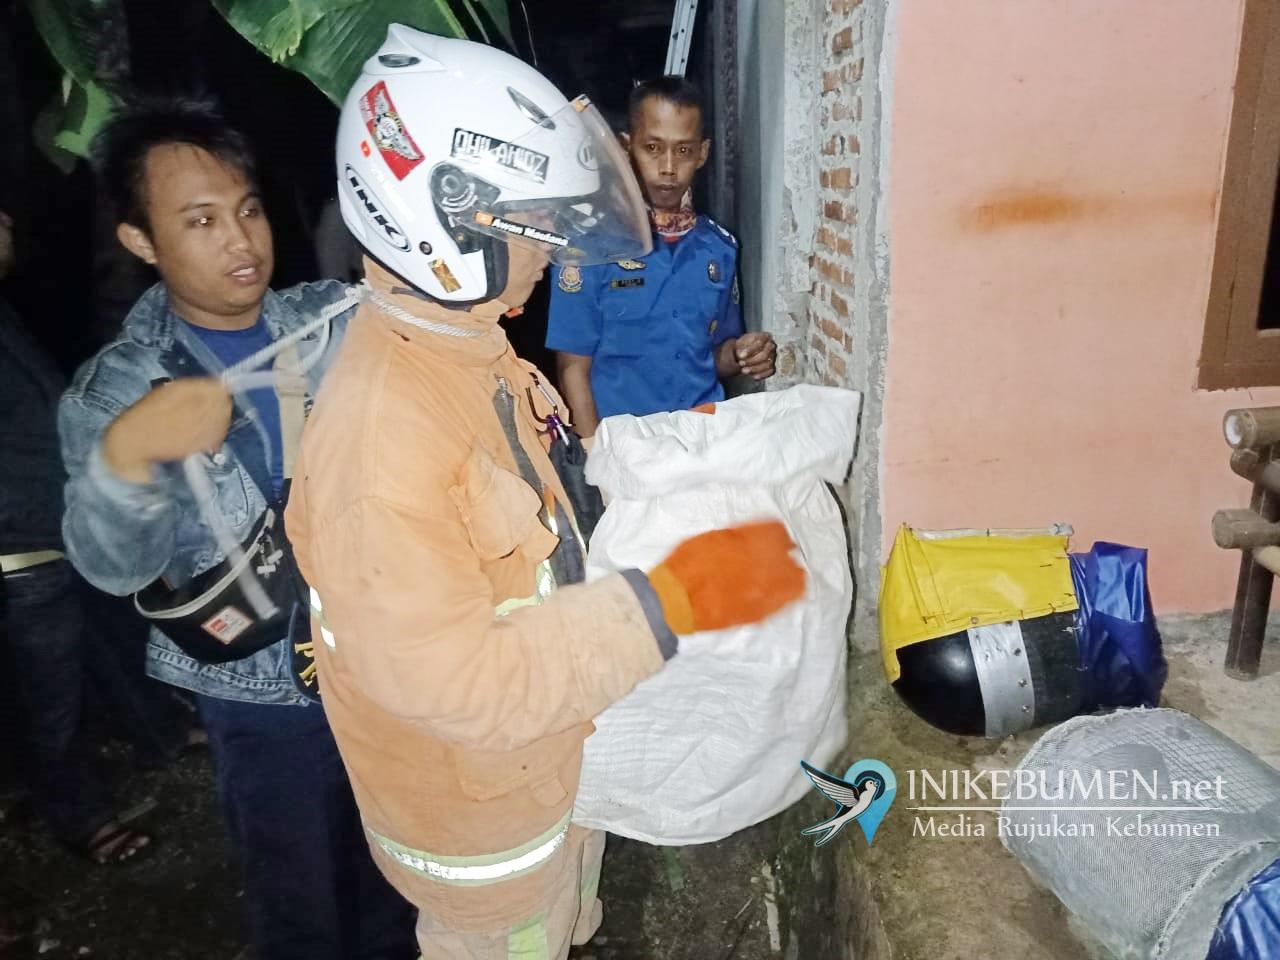 Damkar Gombong dan Polsek Sempor Evakuasi Sarang Tawon Vespa dari Rumah Warga Tunjungseto